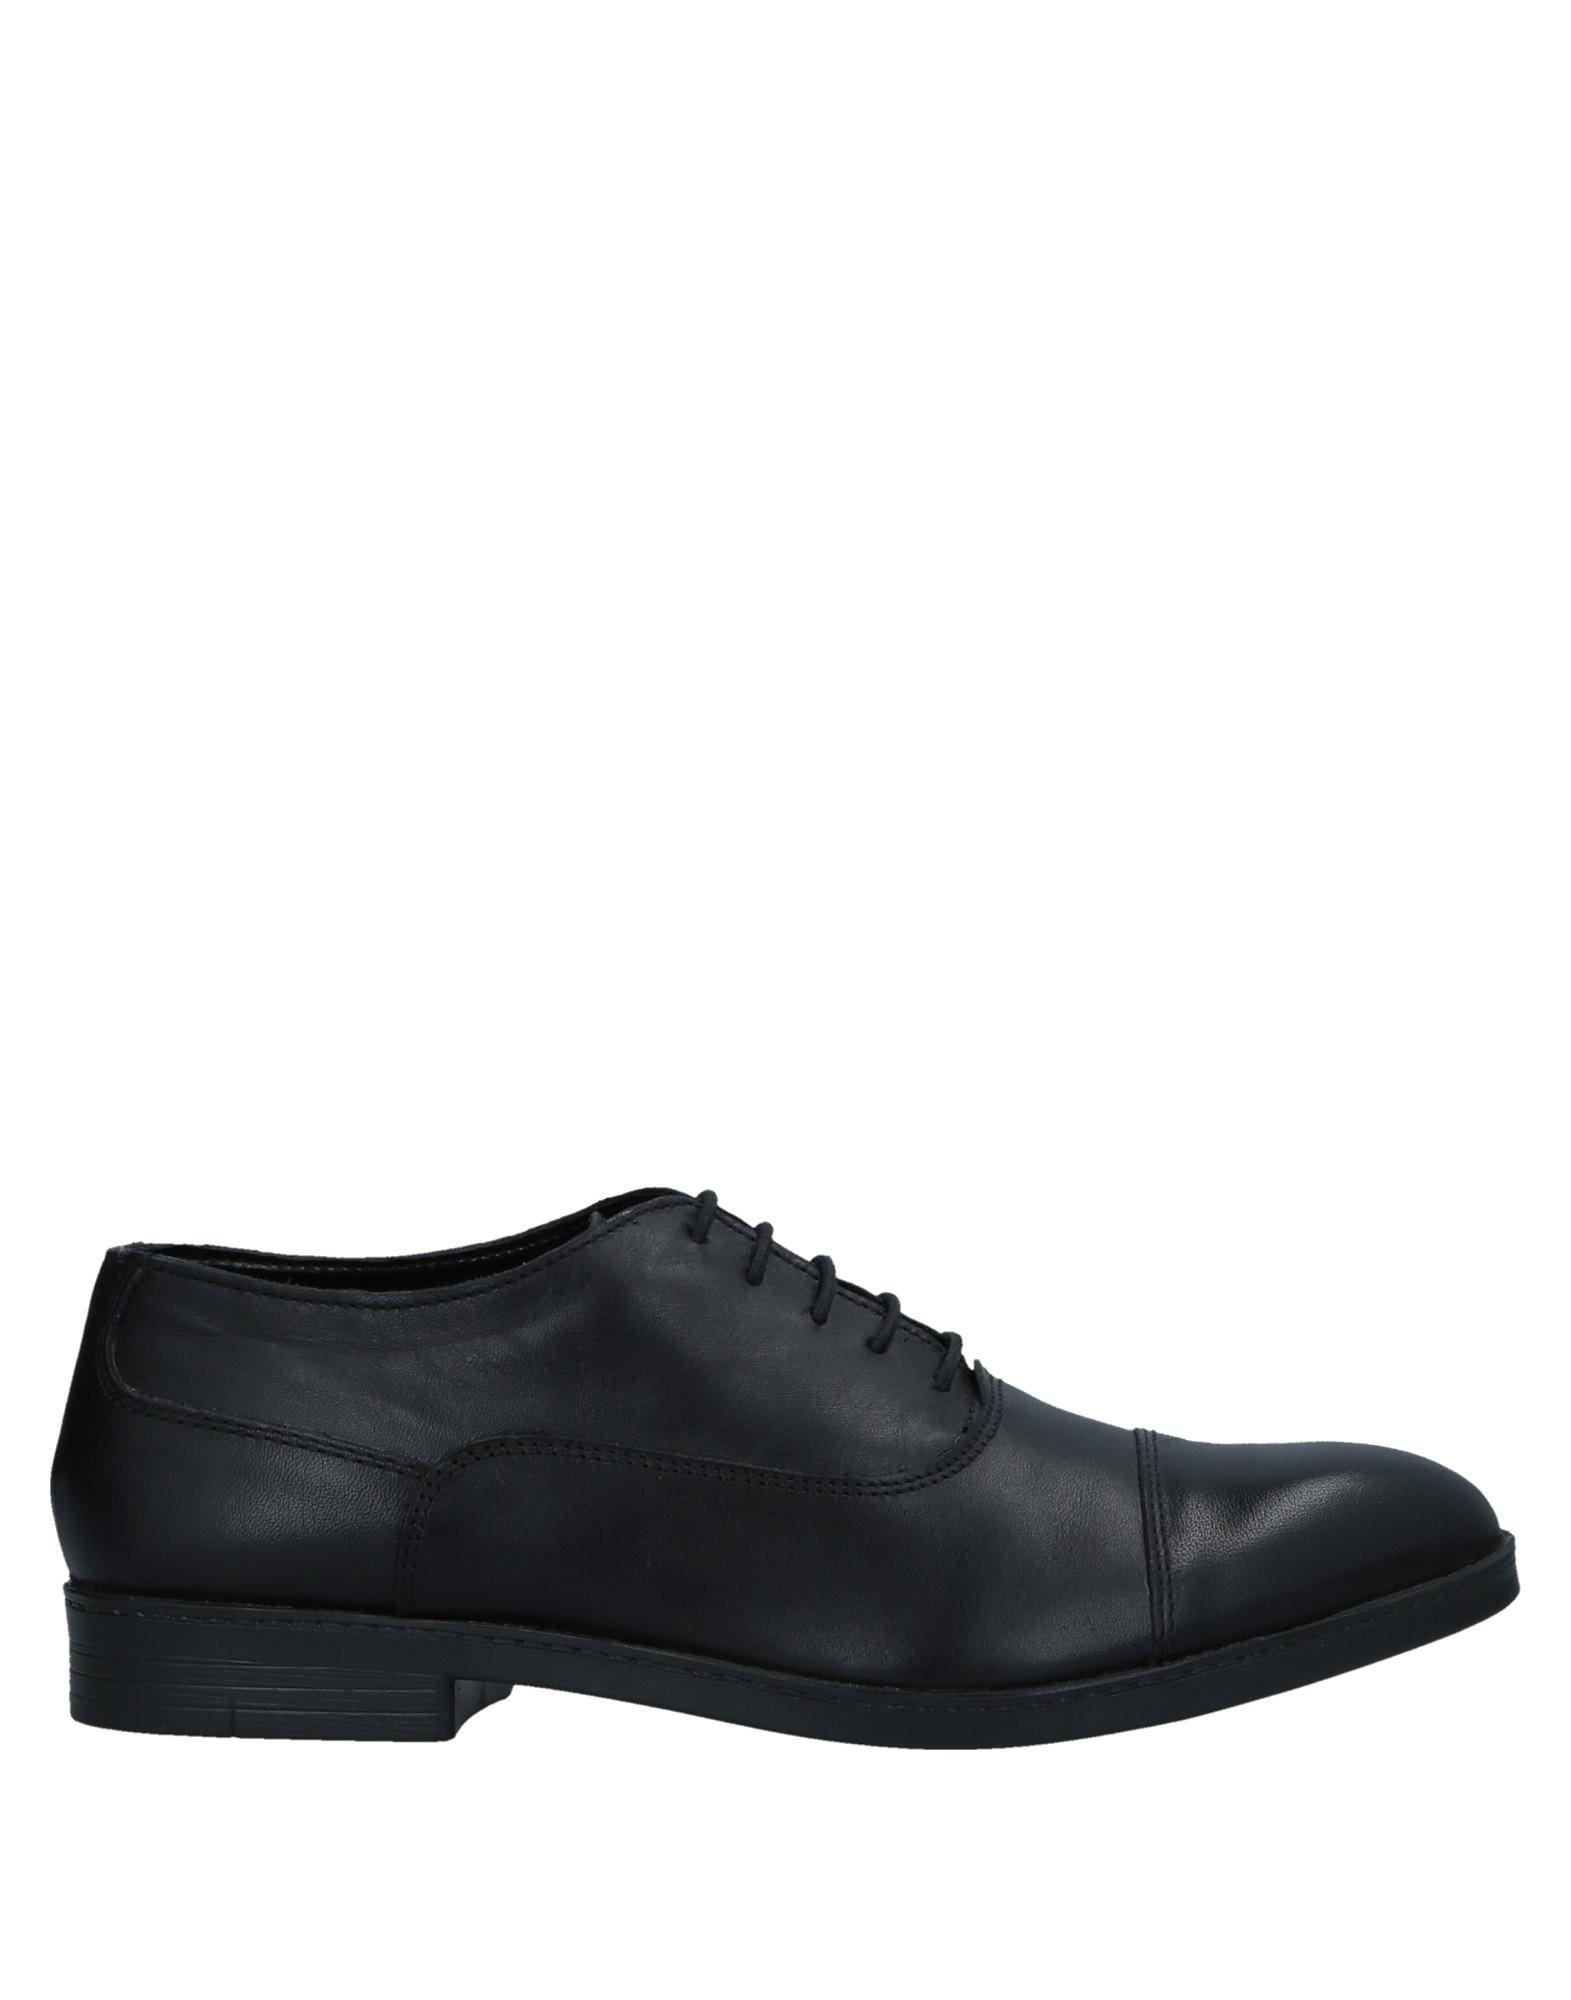 Roberto Della Croce Schnürschuhe Damen beliebte  11531292SP Gute Qualität beliebte Damen Schuhe 27550e